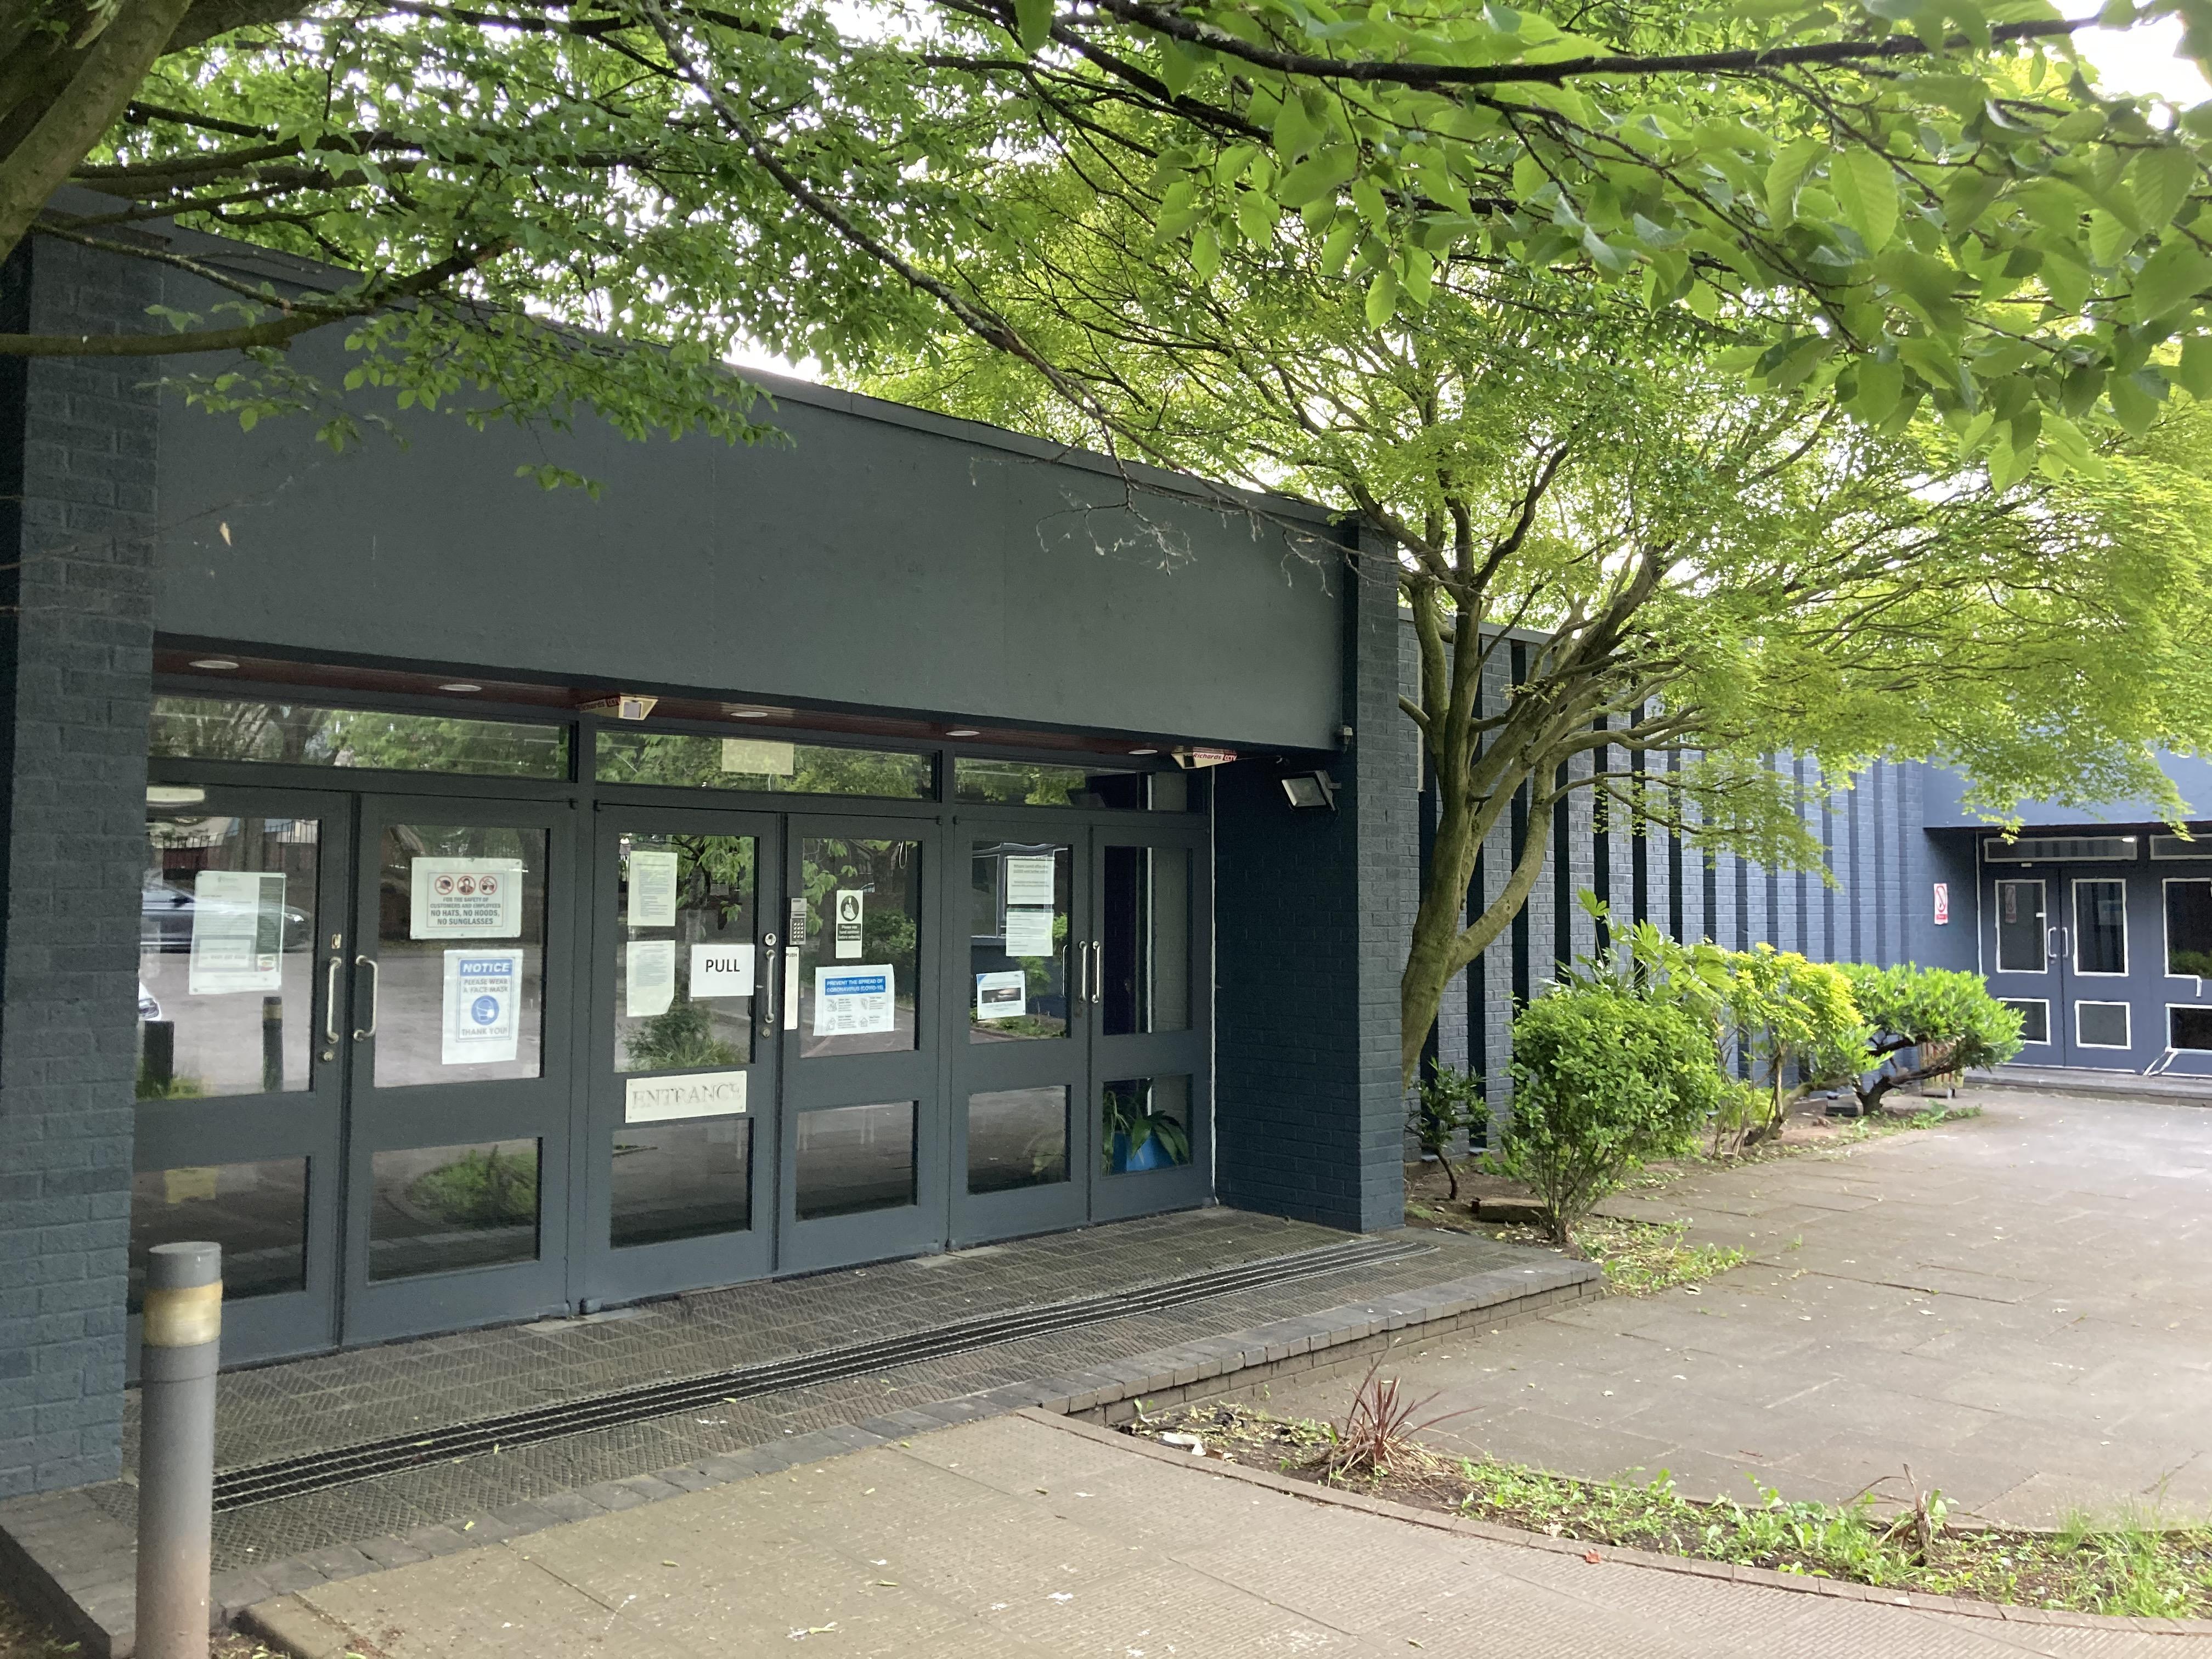 St Georges Hub Birmingham - Click for more details